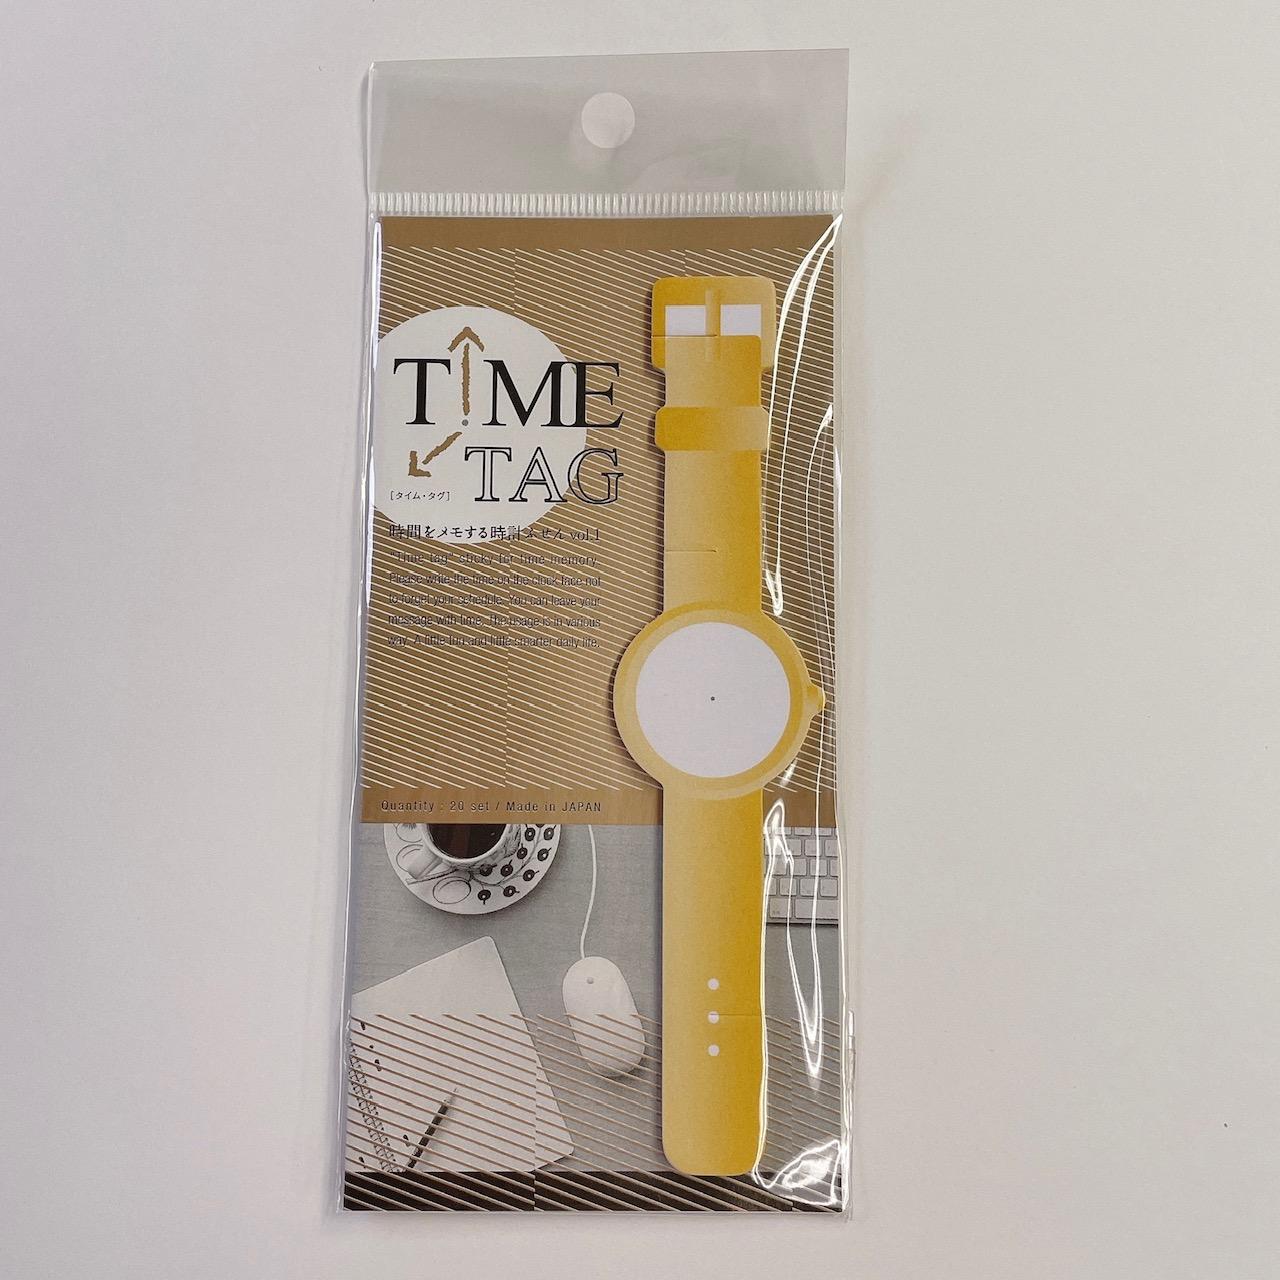 JMT001 TimeTag時間をメモする時計付箋Vol1